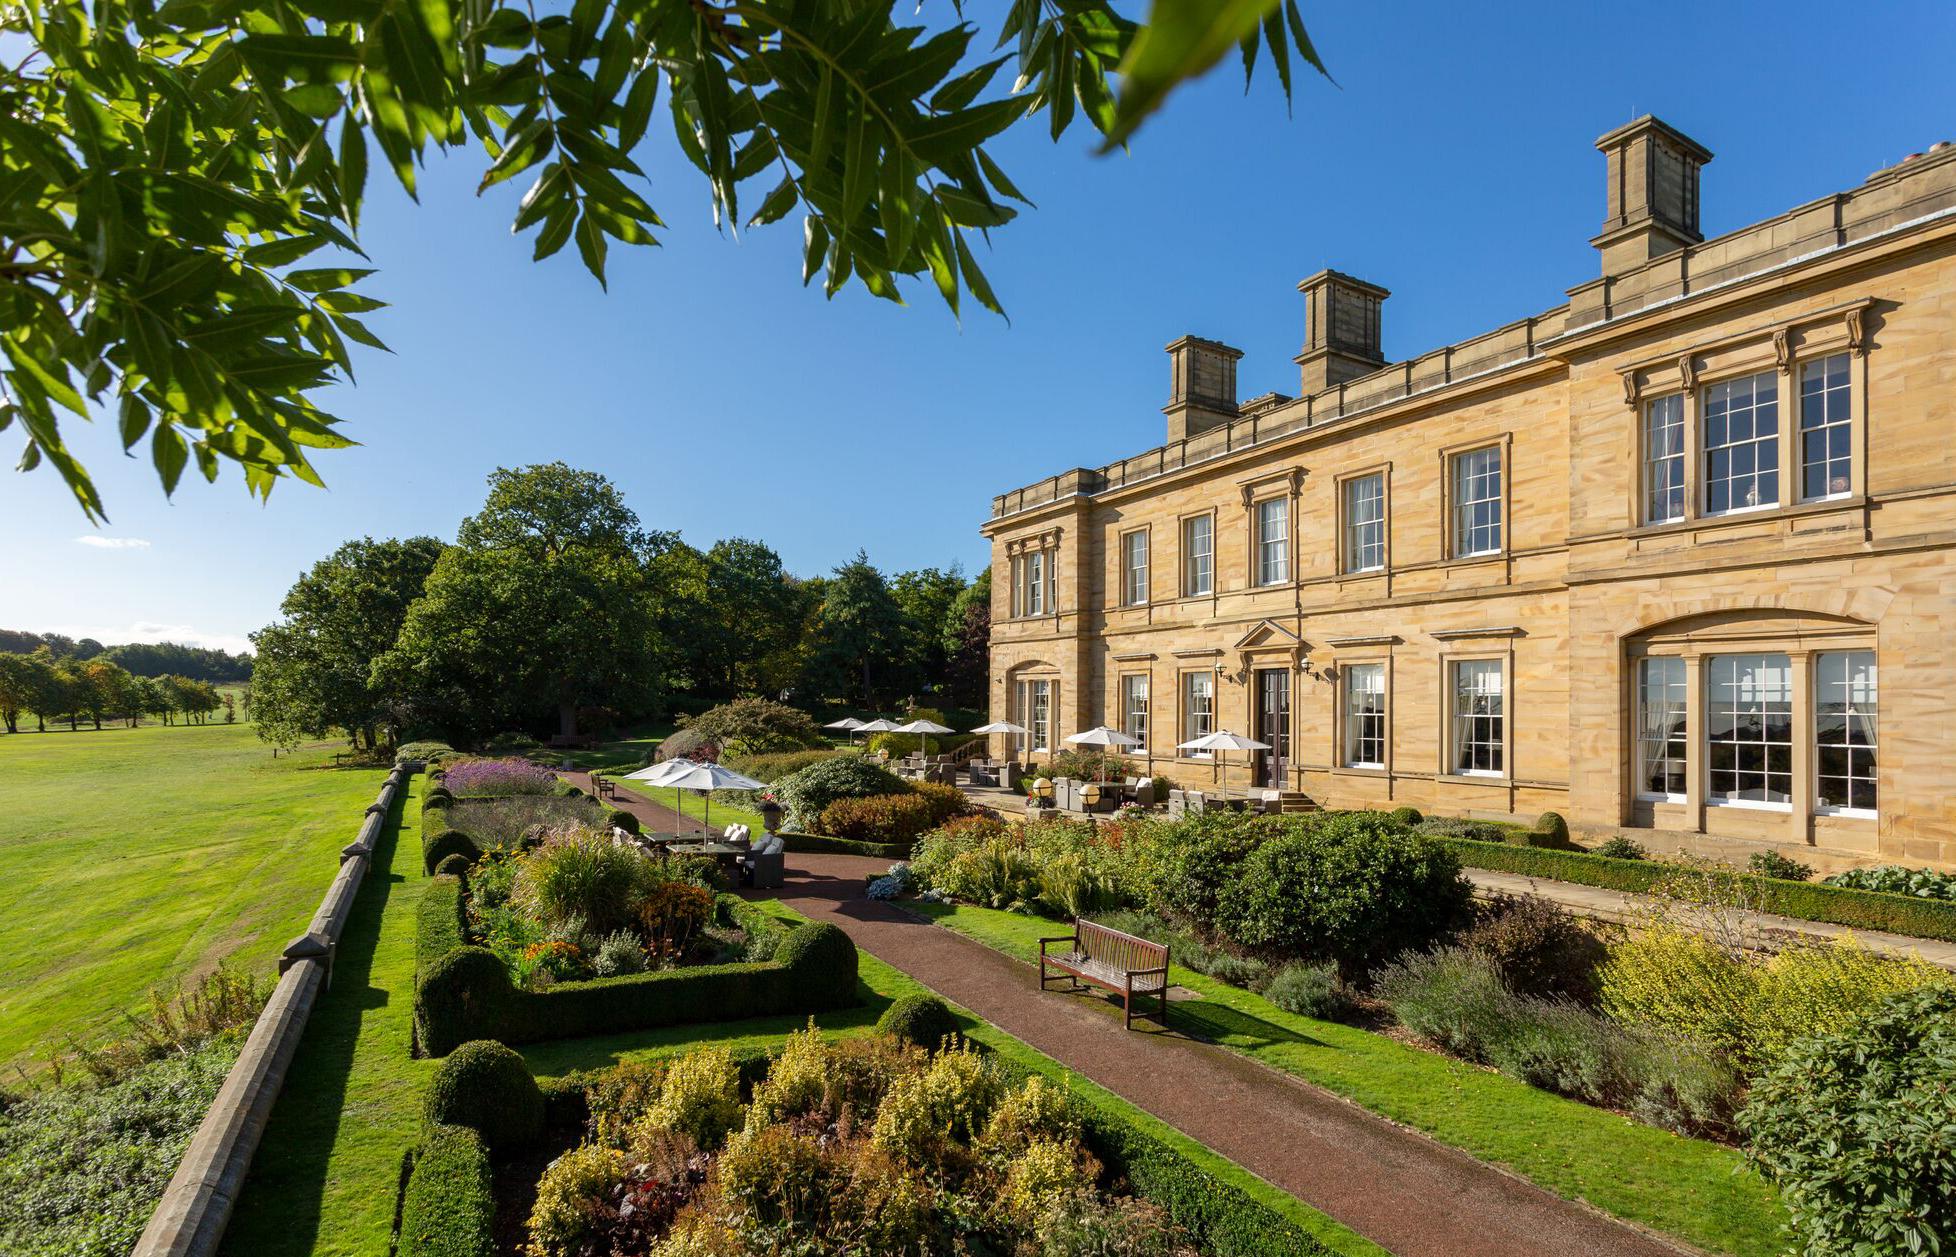 Oulton Hall 4 Star Luxury Hotel Leeds, West Yorkshire